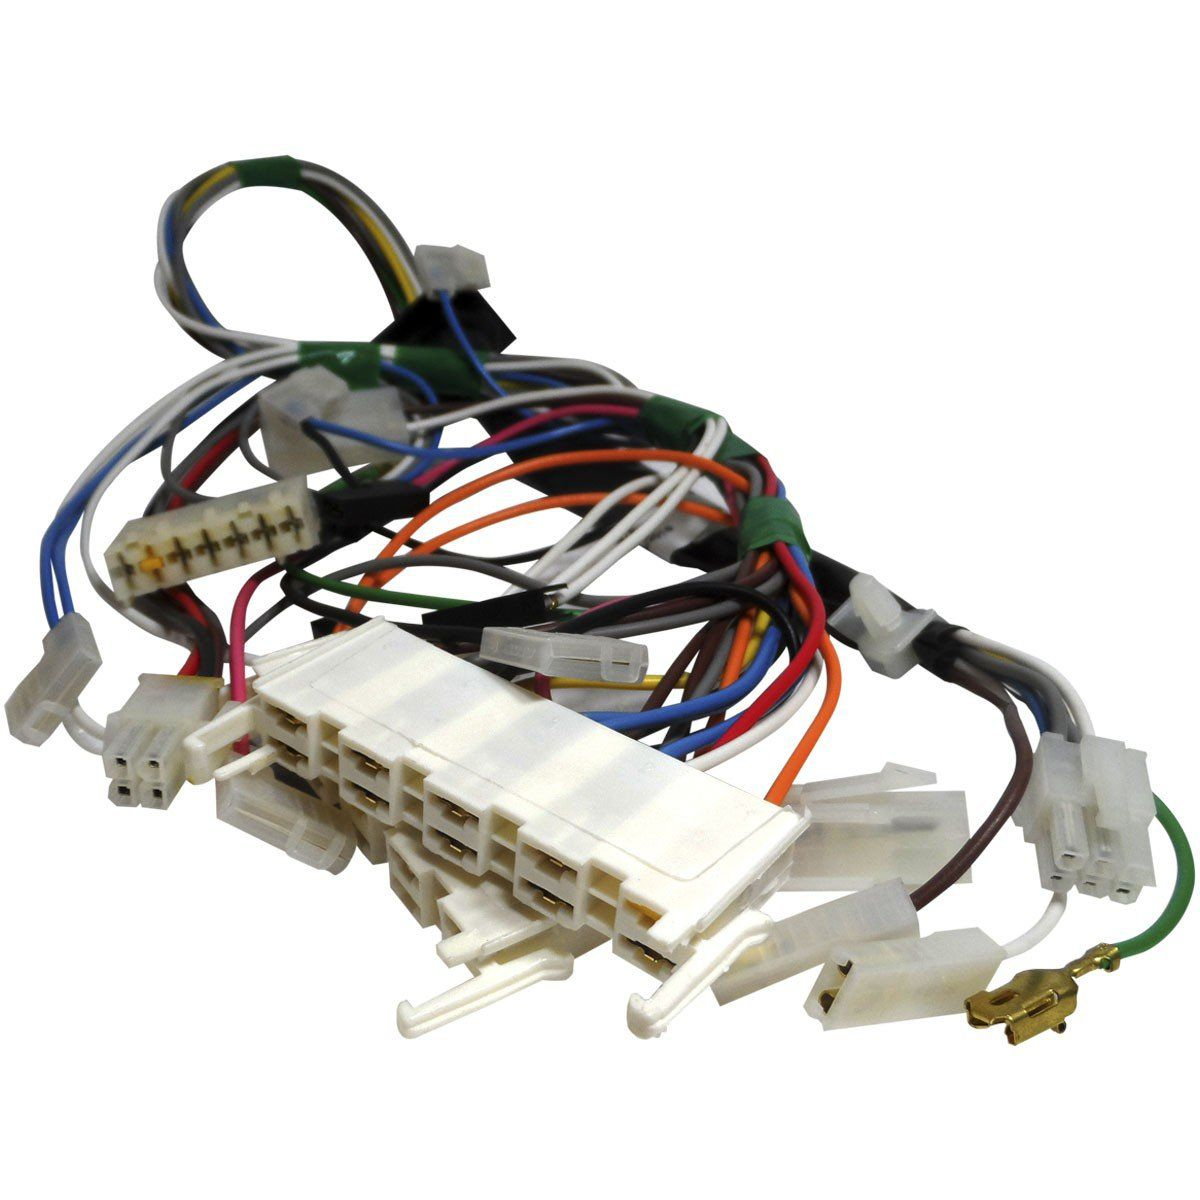 REDE ELÉTRICA SUPERIOR LAVADORA ELECTROLUX 64590777